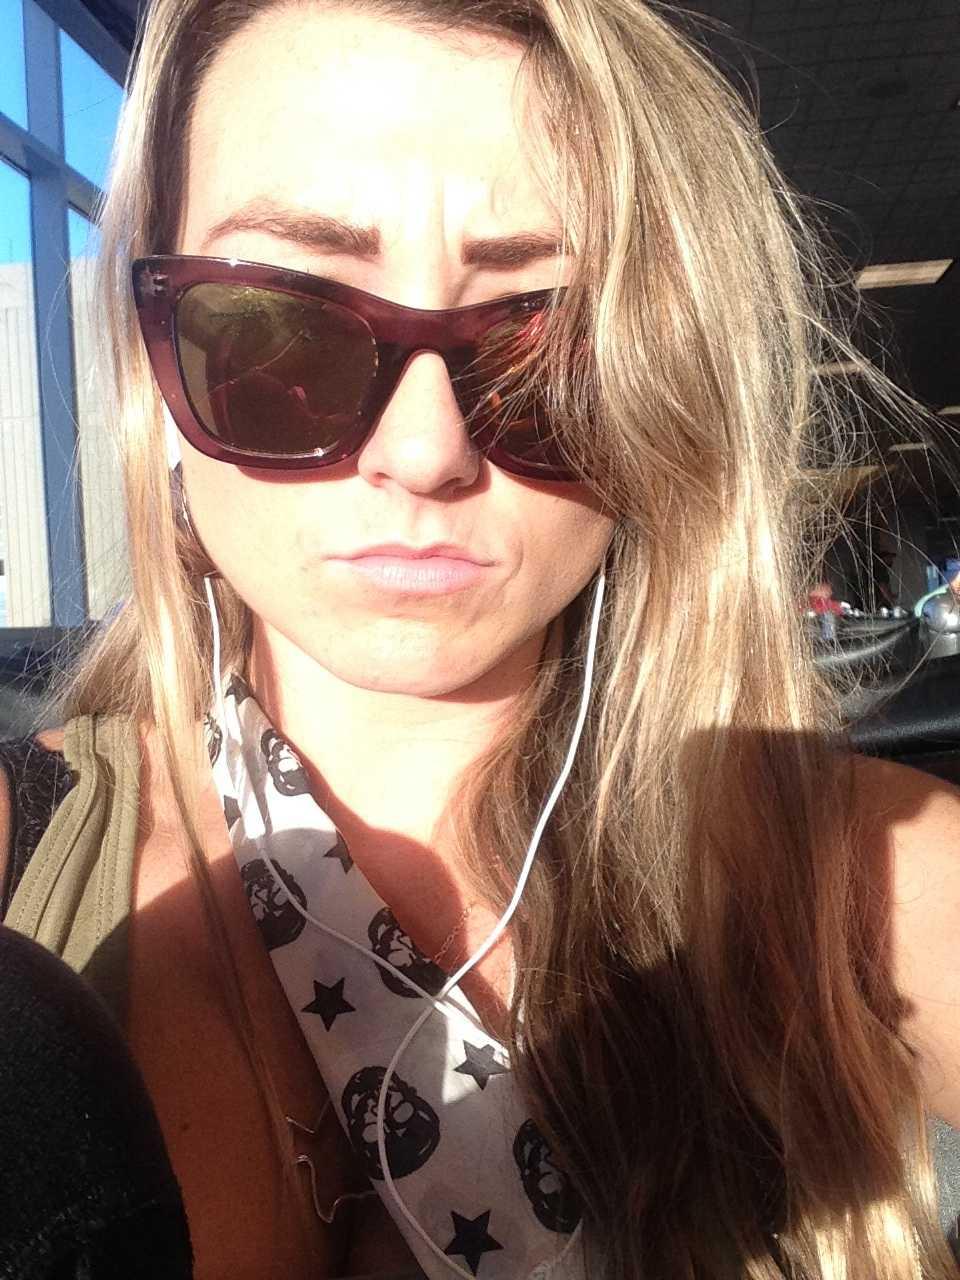 10. Reclaimed Sunglasses